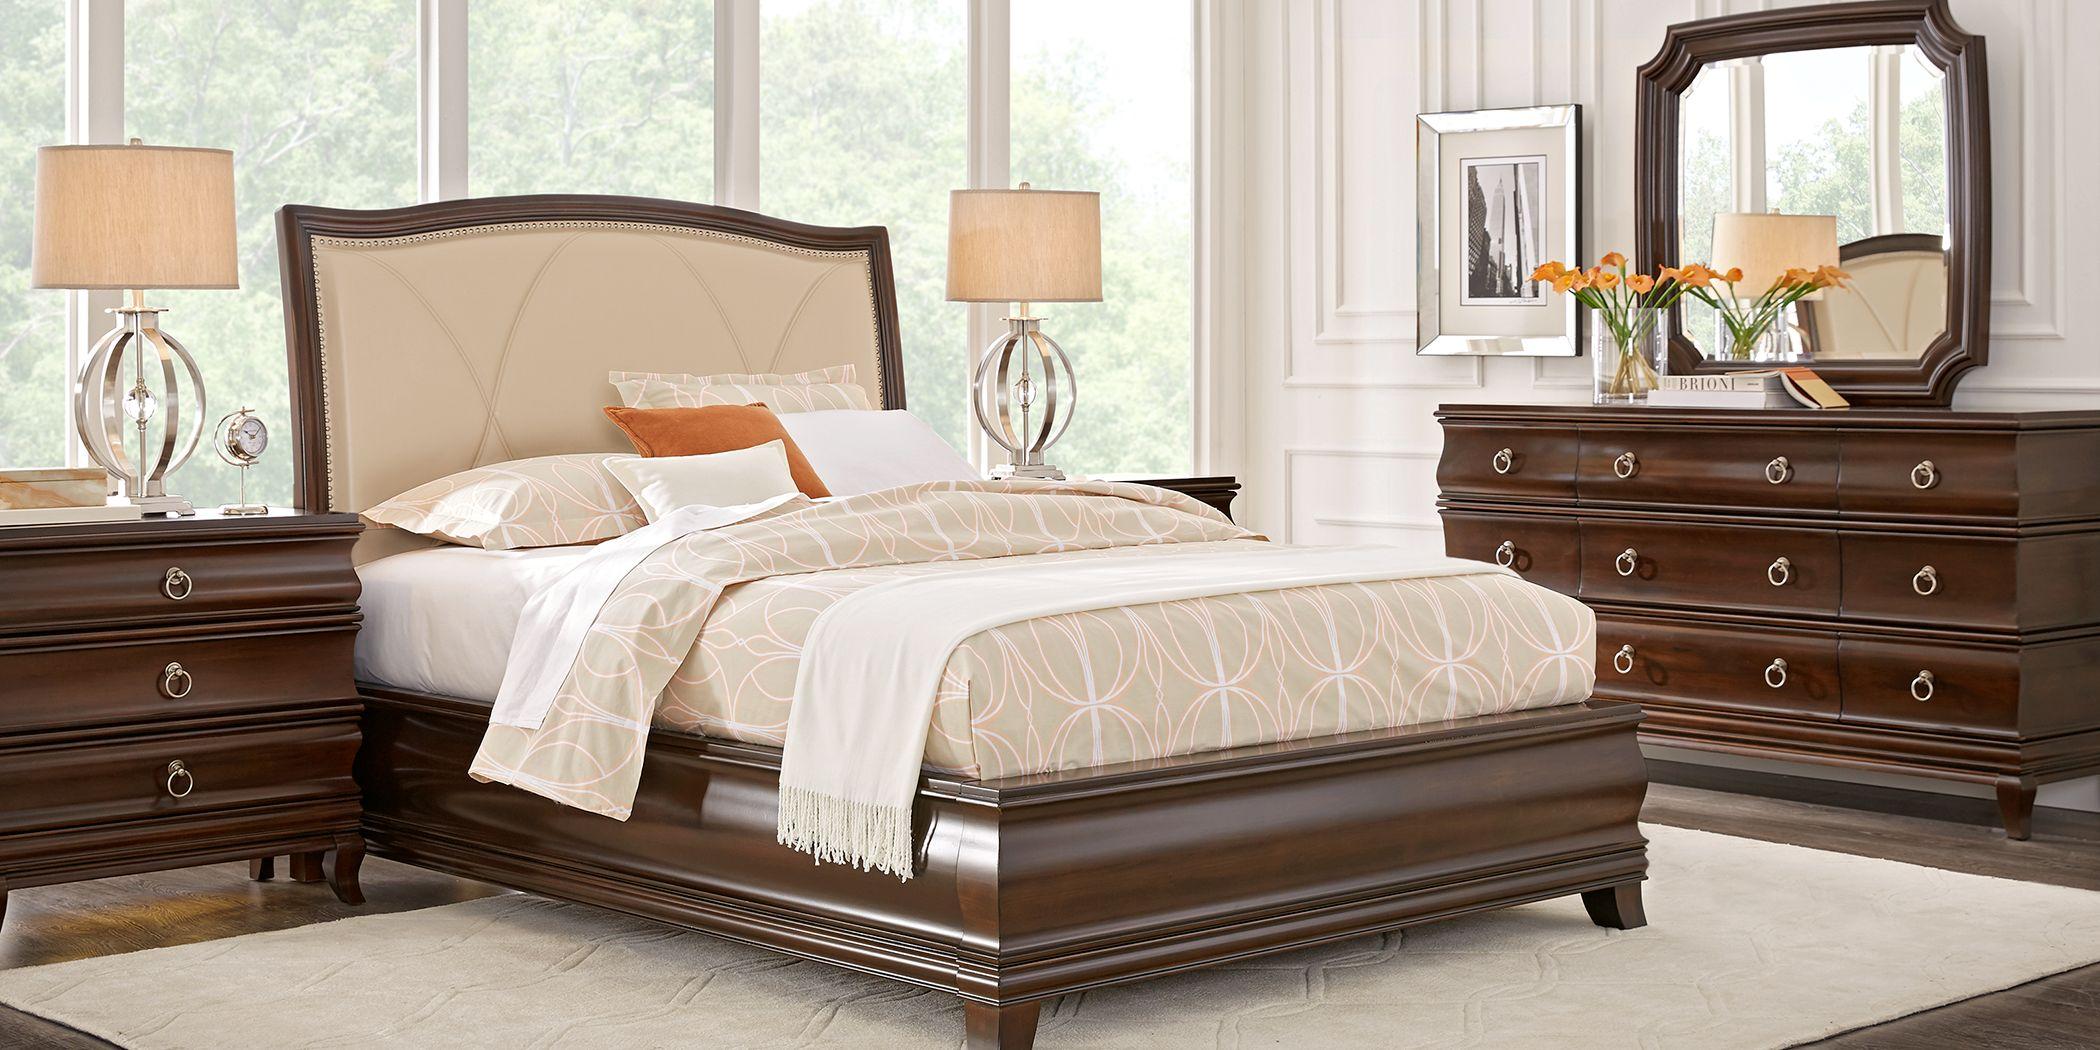 Alexi Cherry 7 Pc Queen Panel Bedroom with Cream Inset